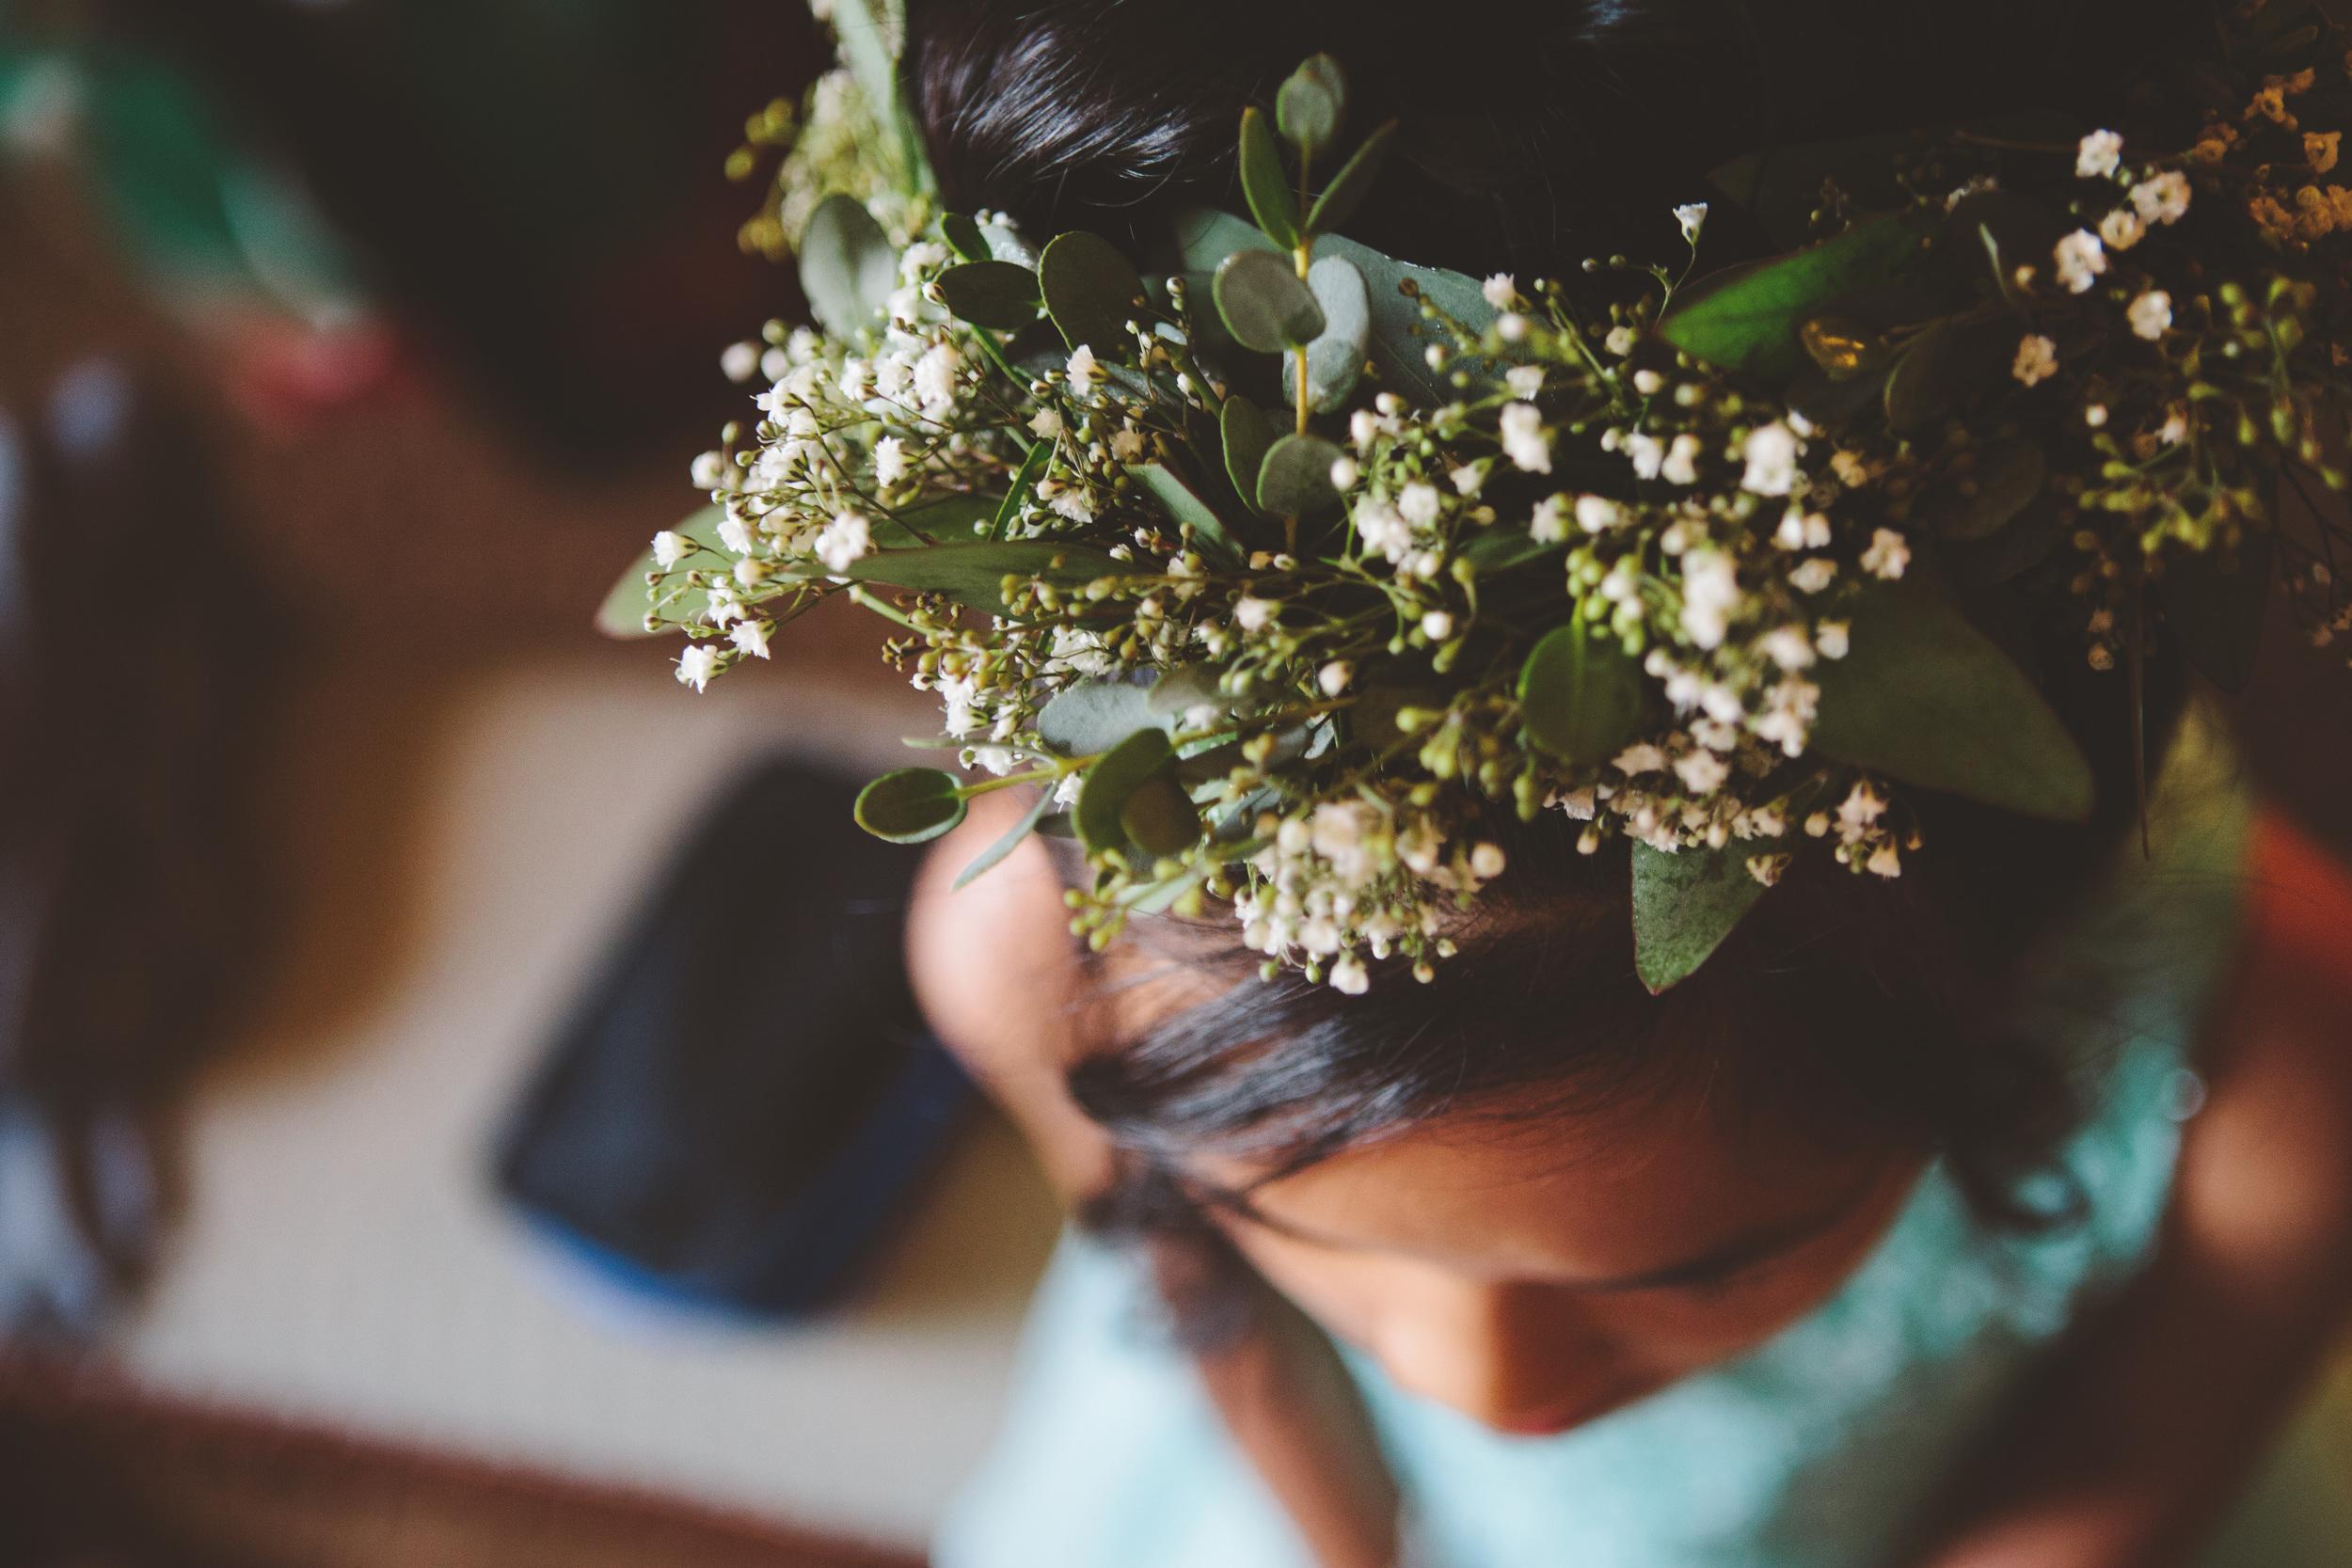 the-bees-knees-floral-design-studio-brainerd-mn-minnesota-florist-wedding-weddings-bride-greenery-crown-babys-breath